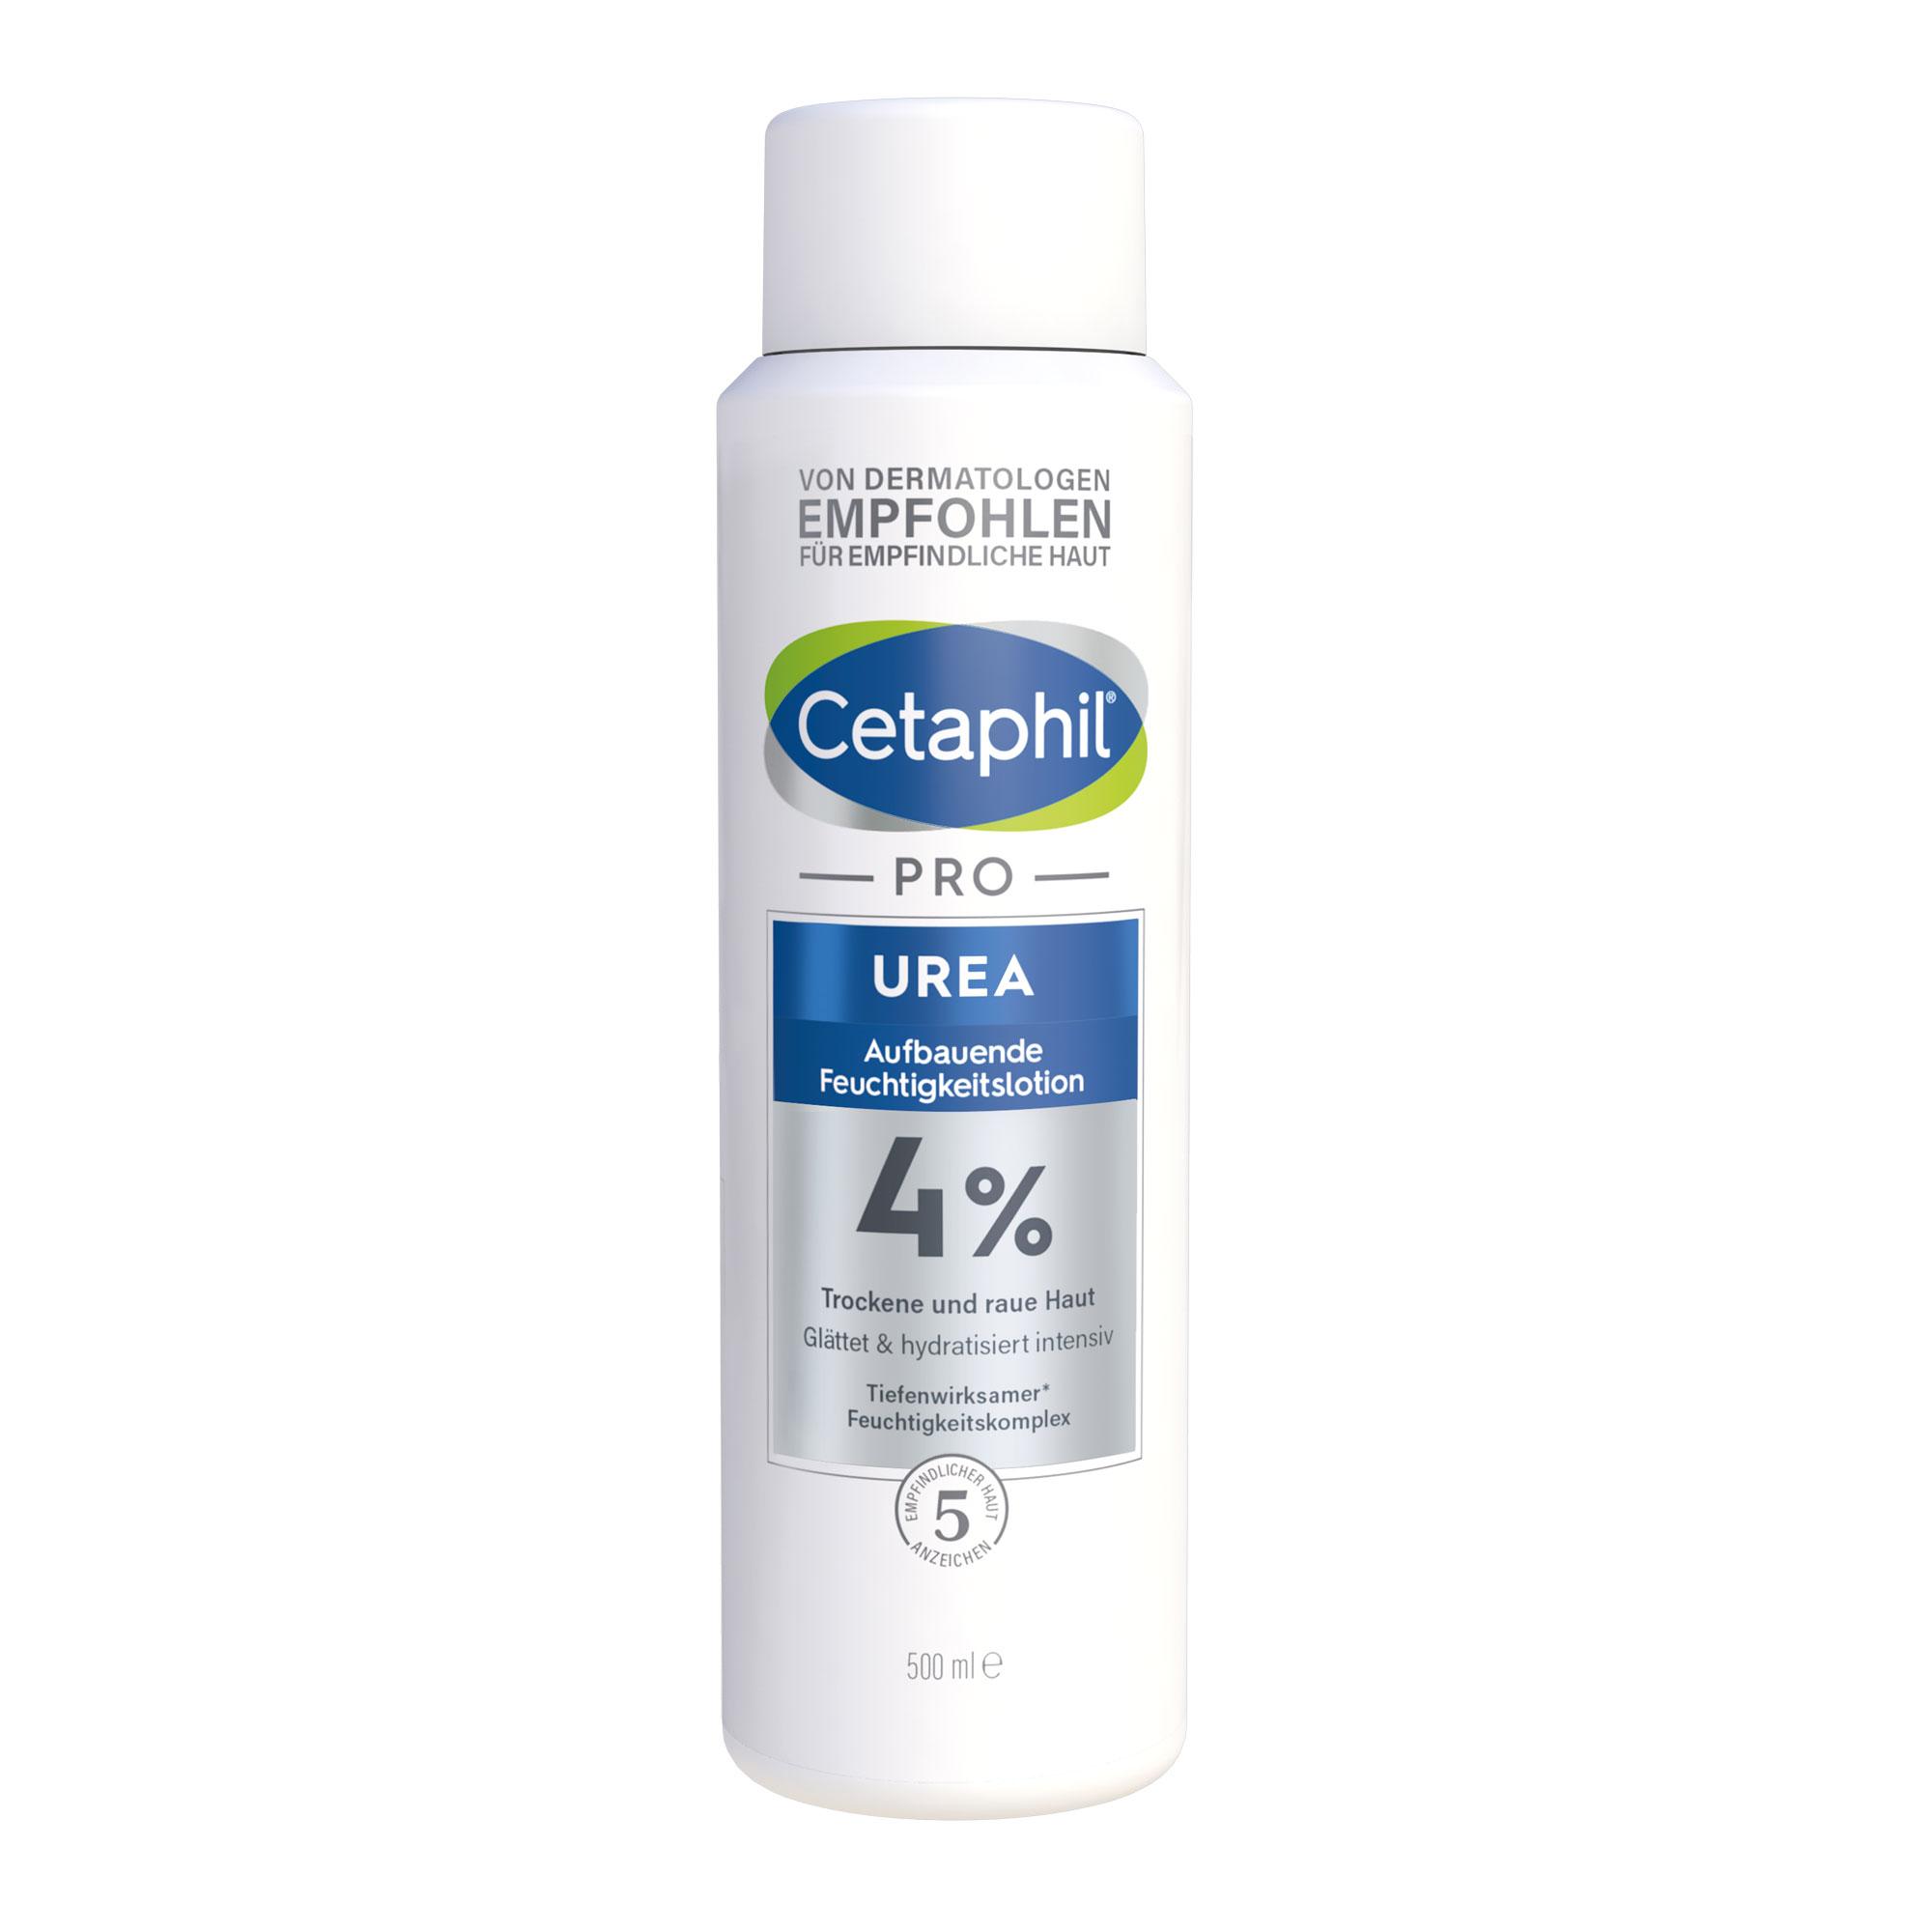 Cetaphil Pro Urea 4% Lotion